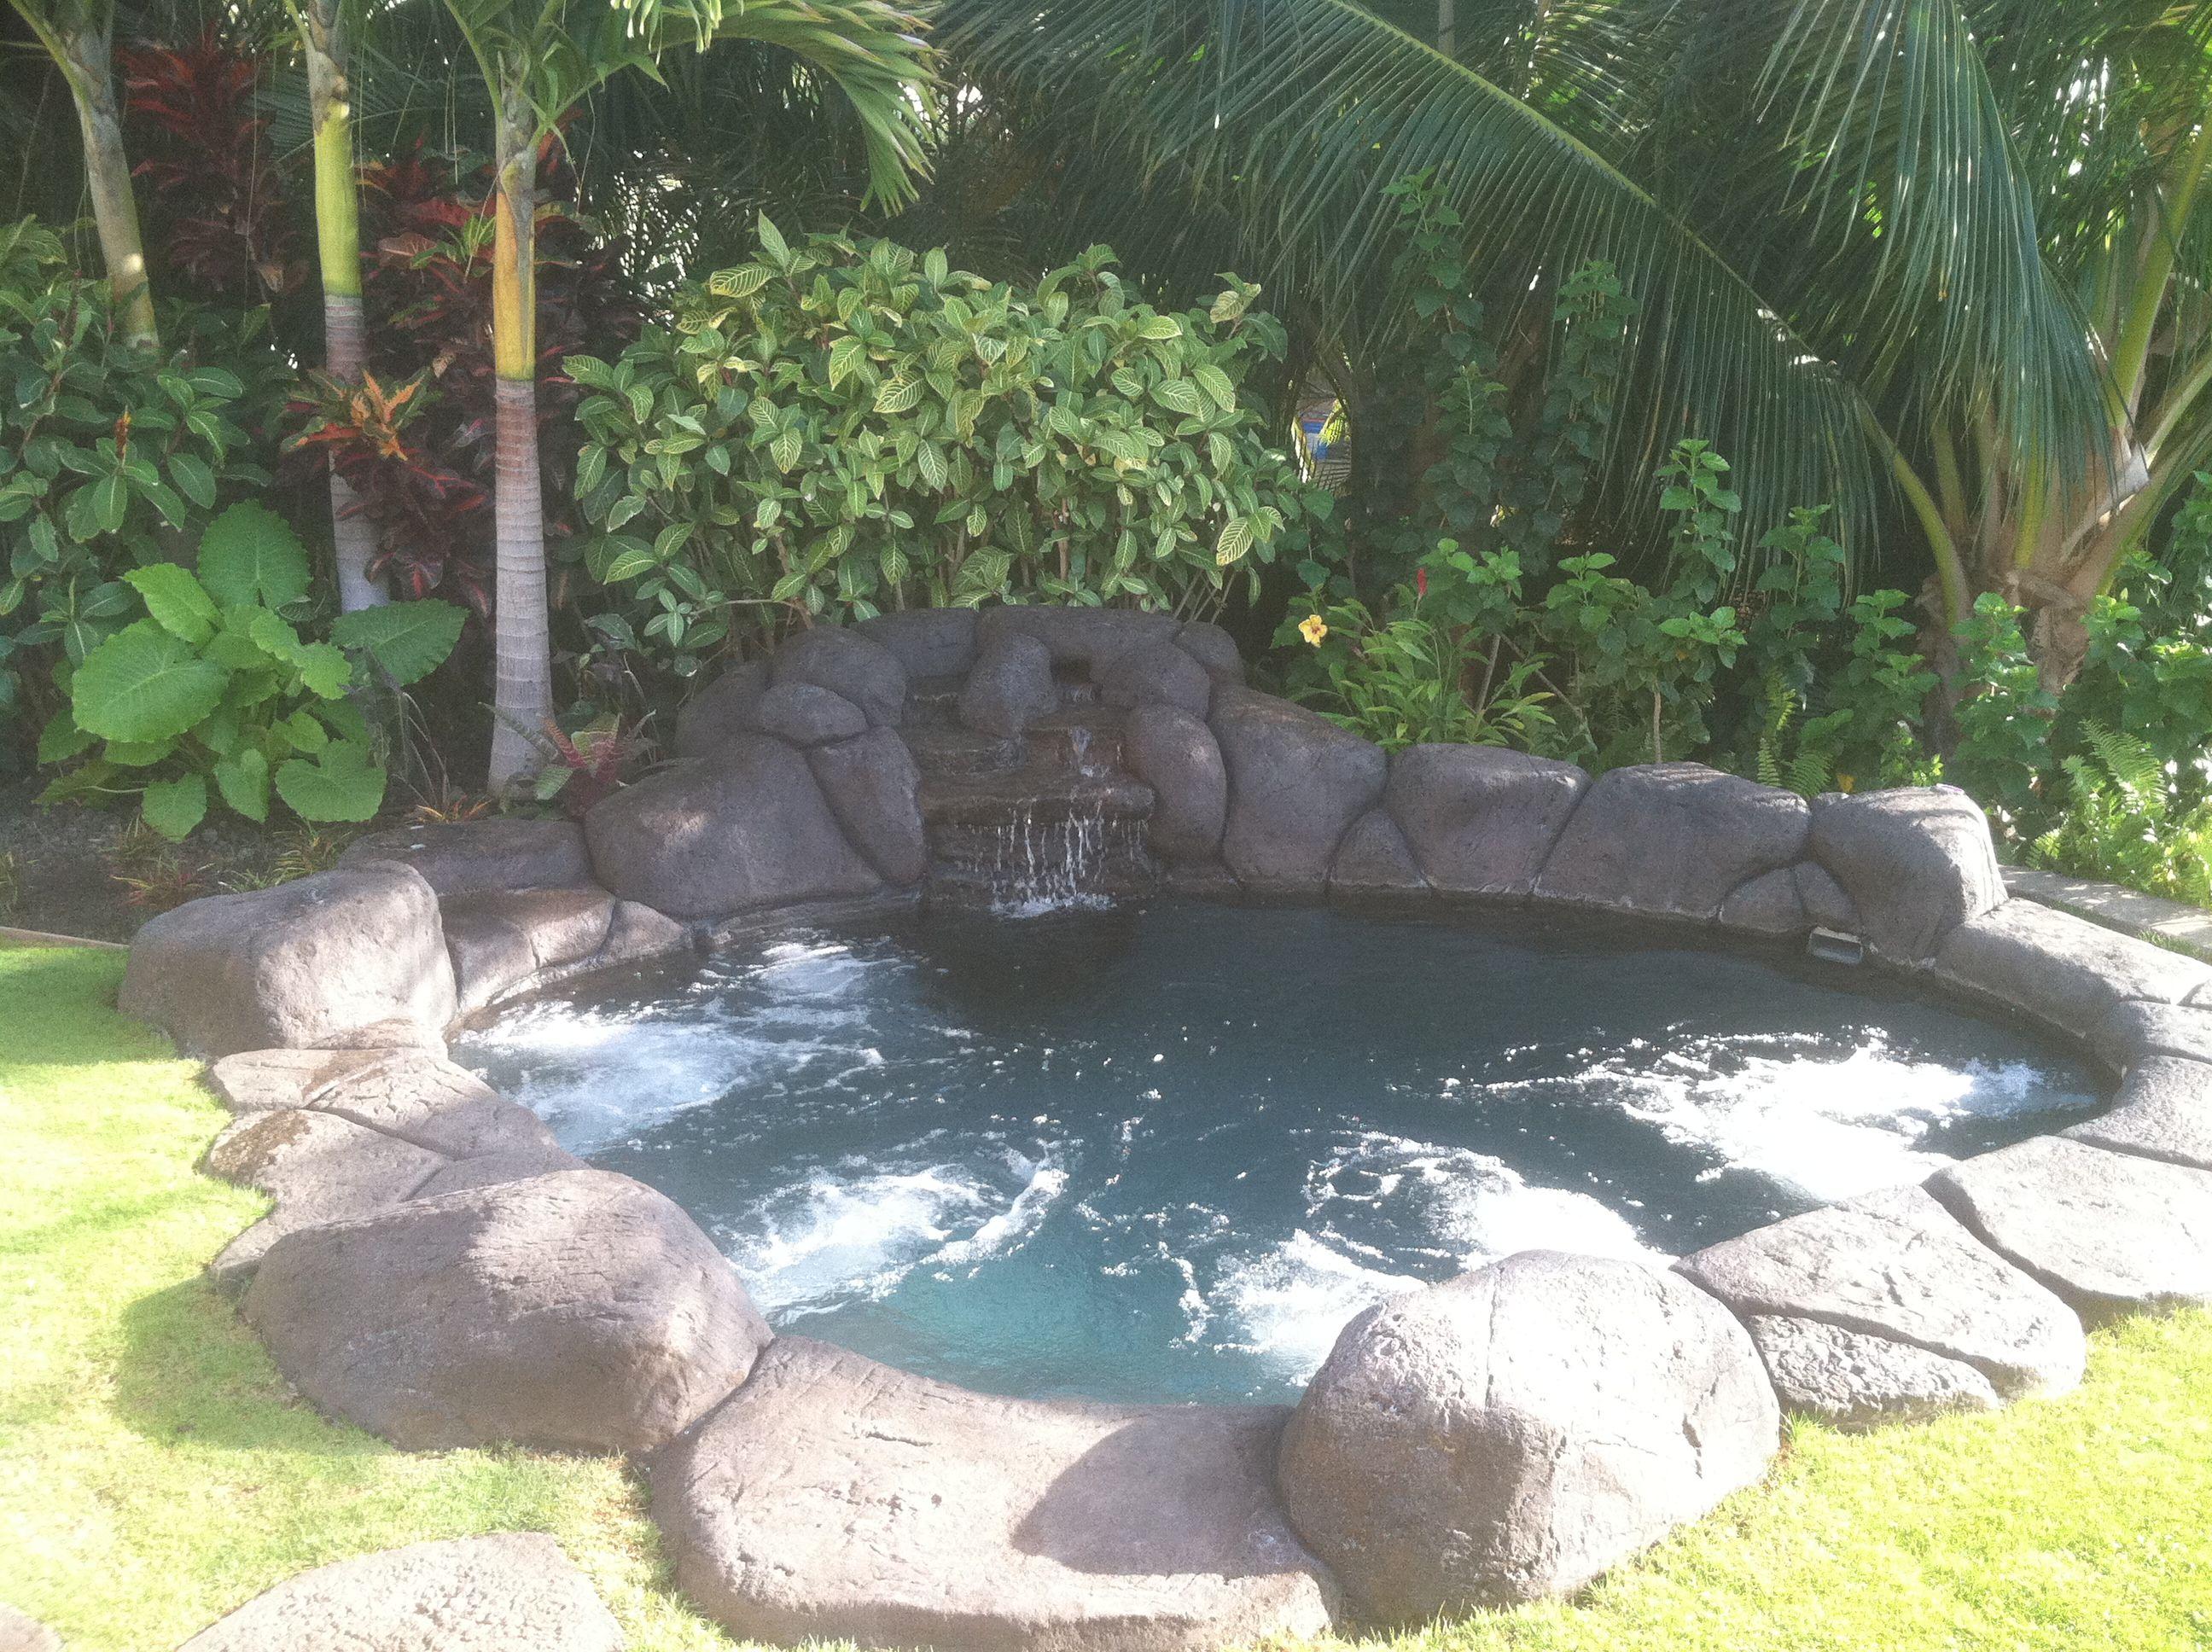 Pin By Huber Pools Inc On Cool Pools Swimming Pools Backyard Pool Hot Tub Backyard Oasis Diy